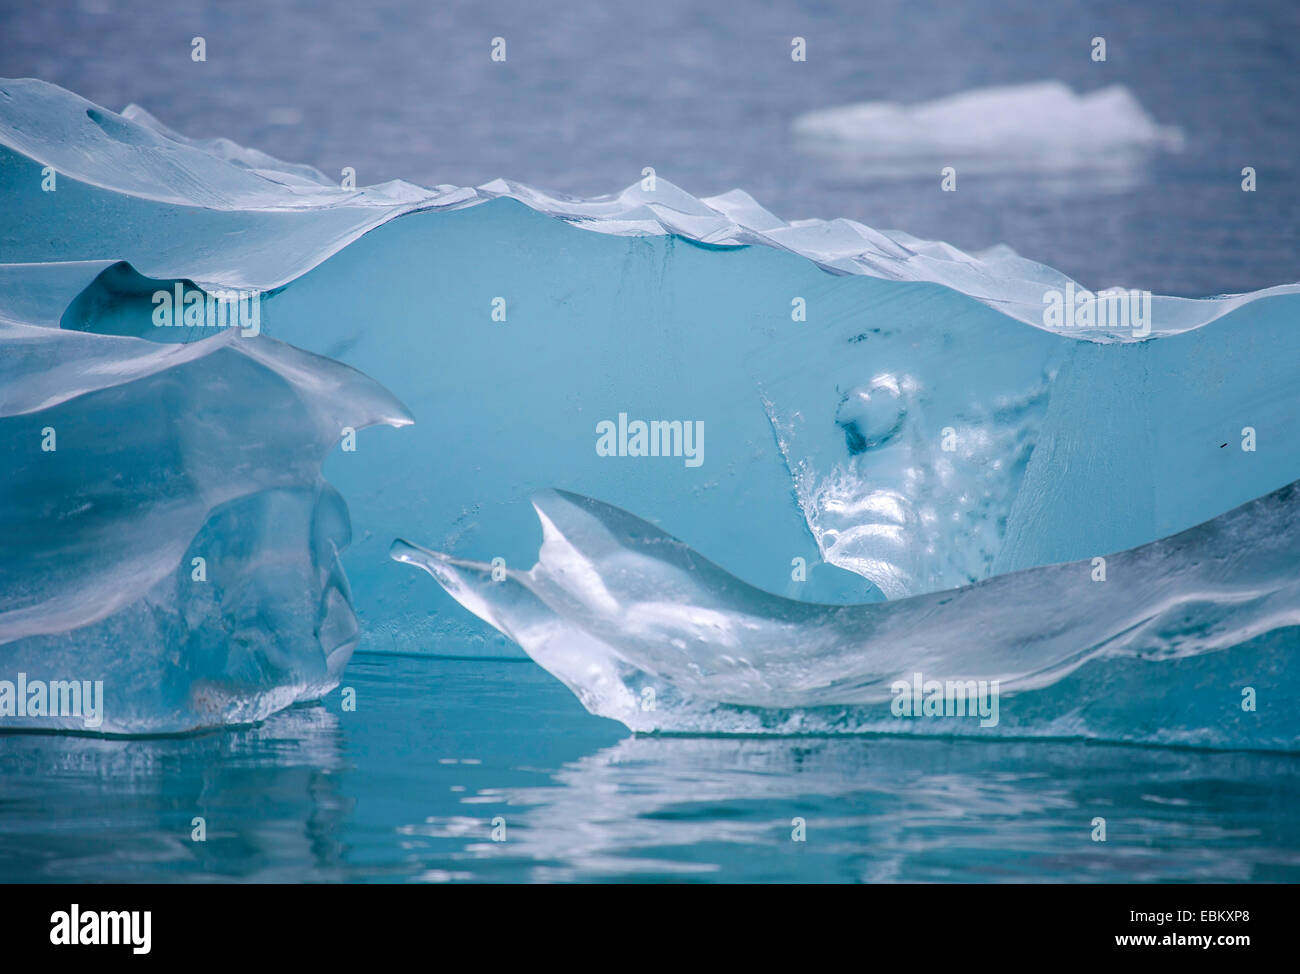 Gletschereis geformte unheimlich, Norwegen, Spitzbergen, Hamiltonbukta Stockbild